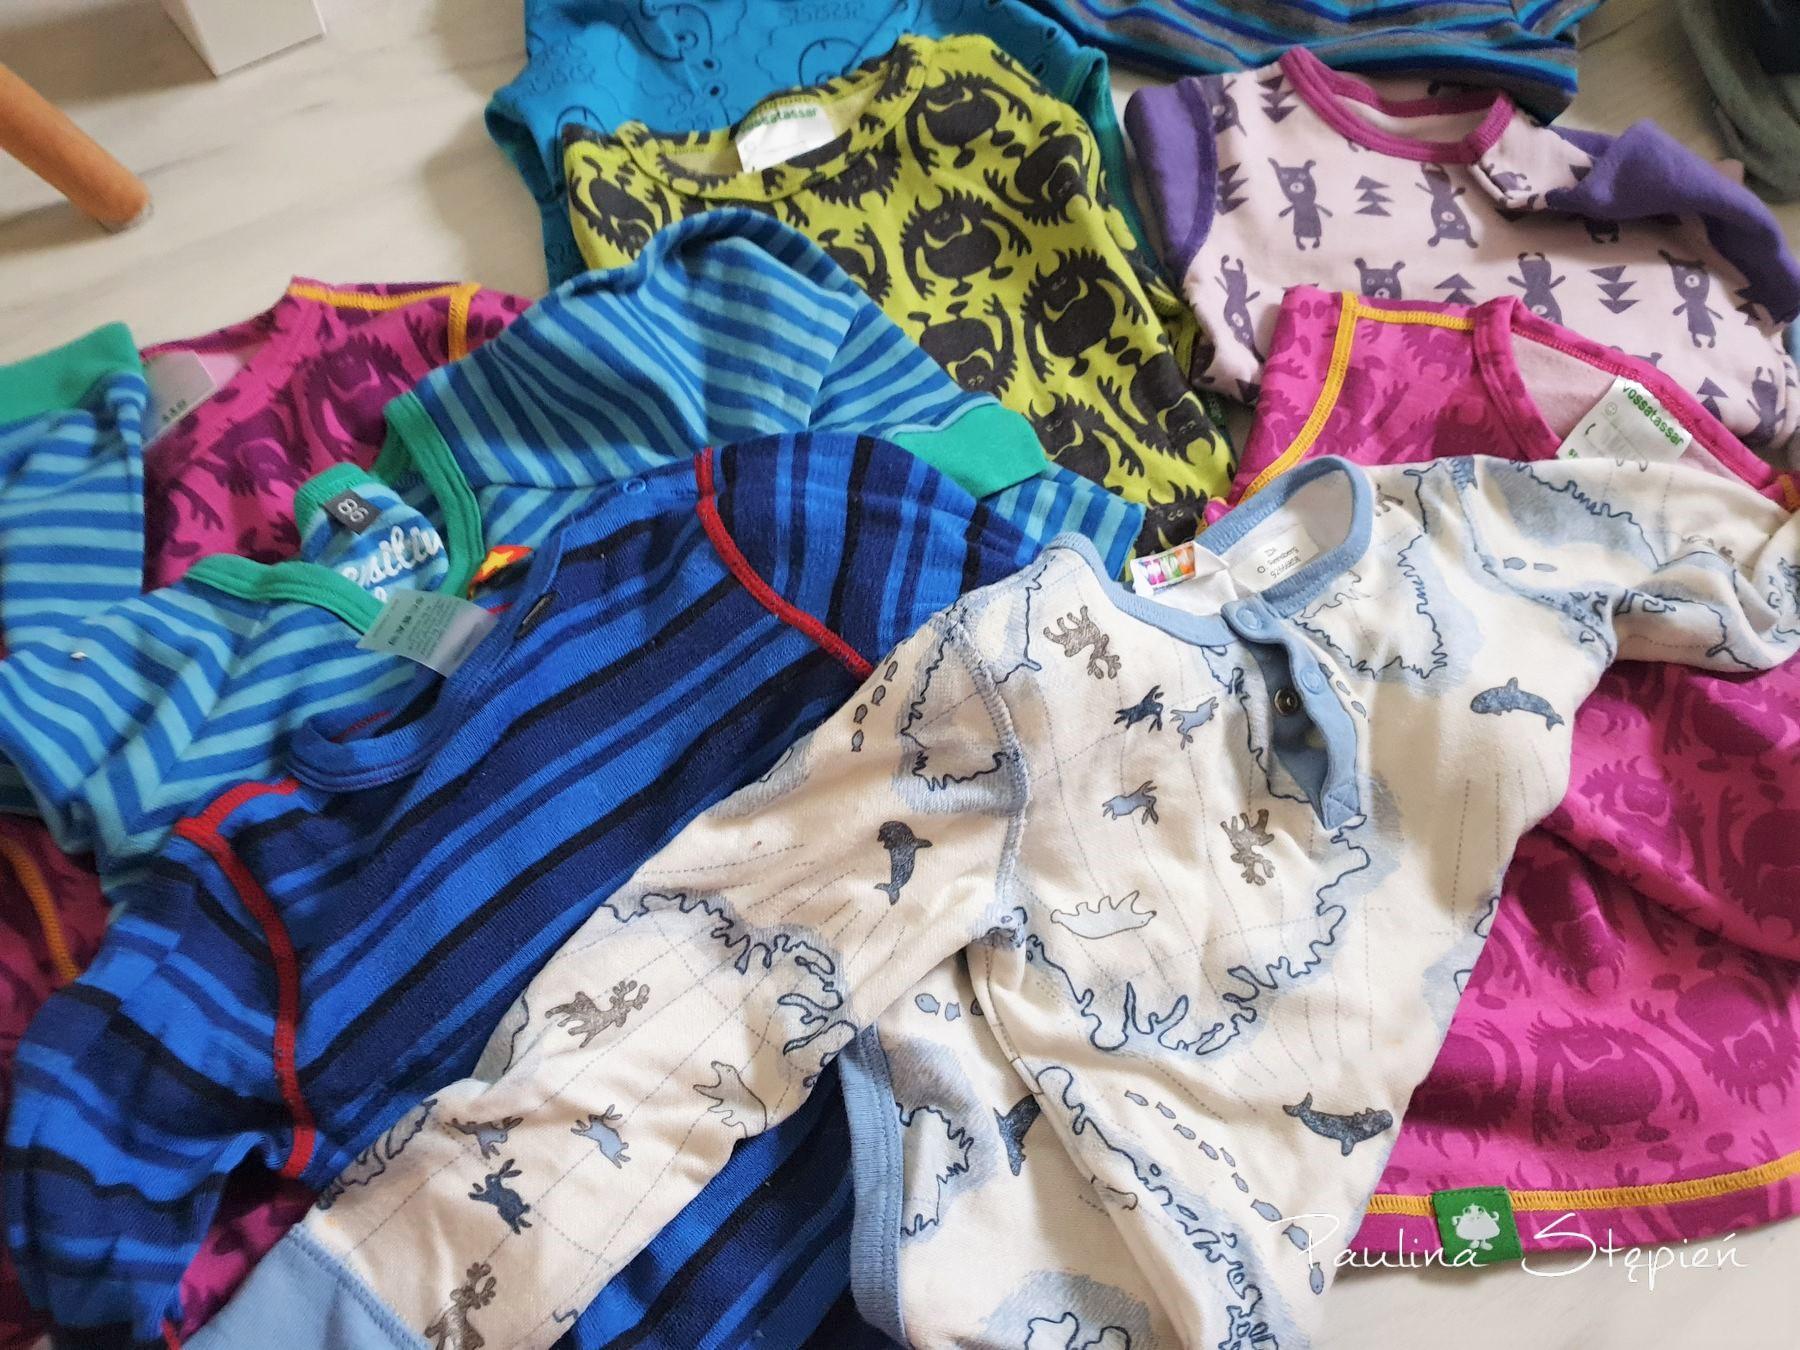 Wełniane ubrania